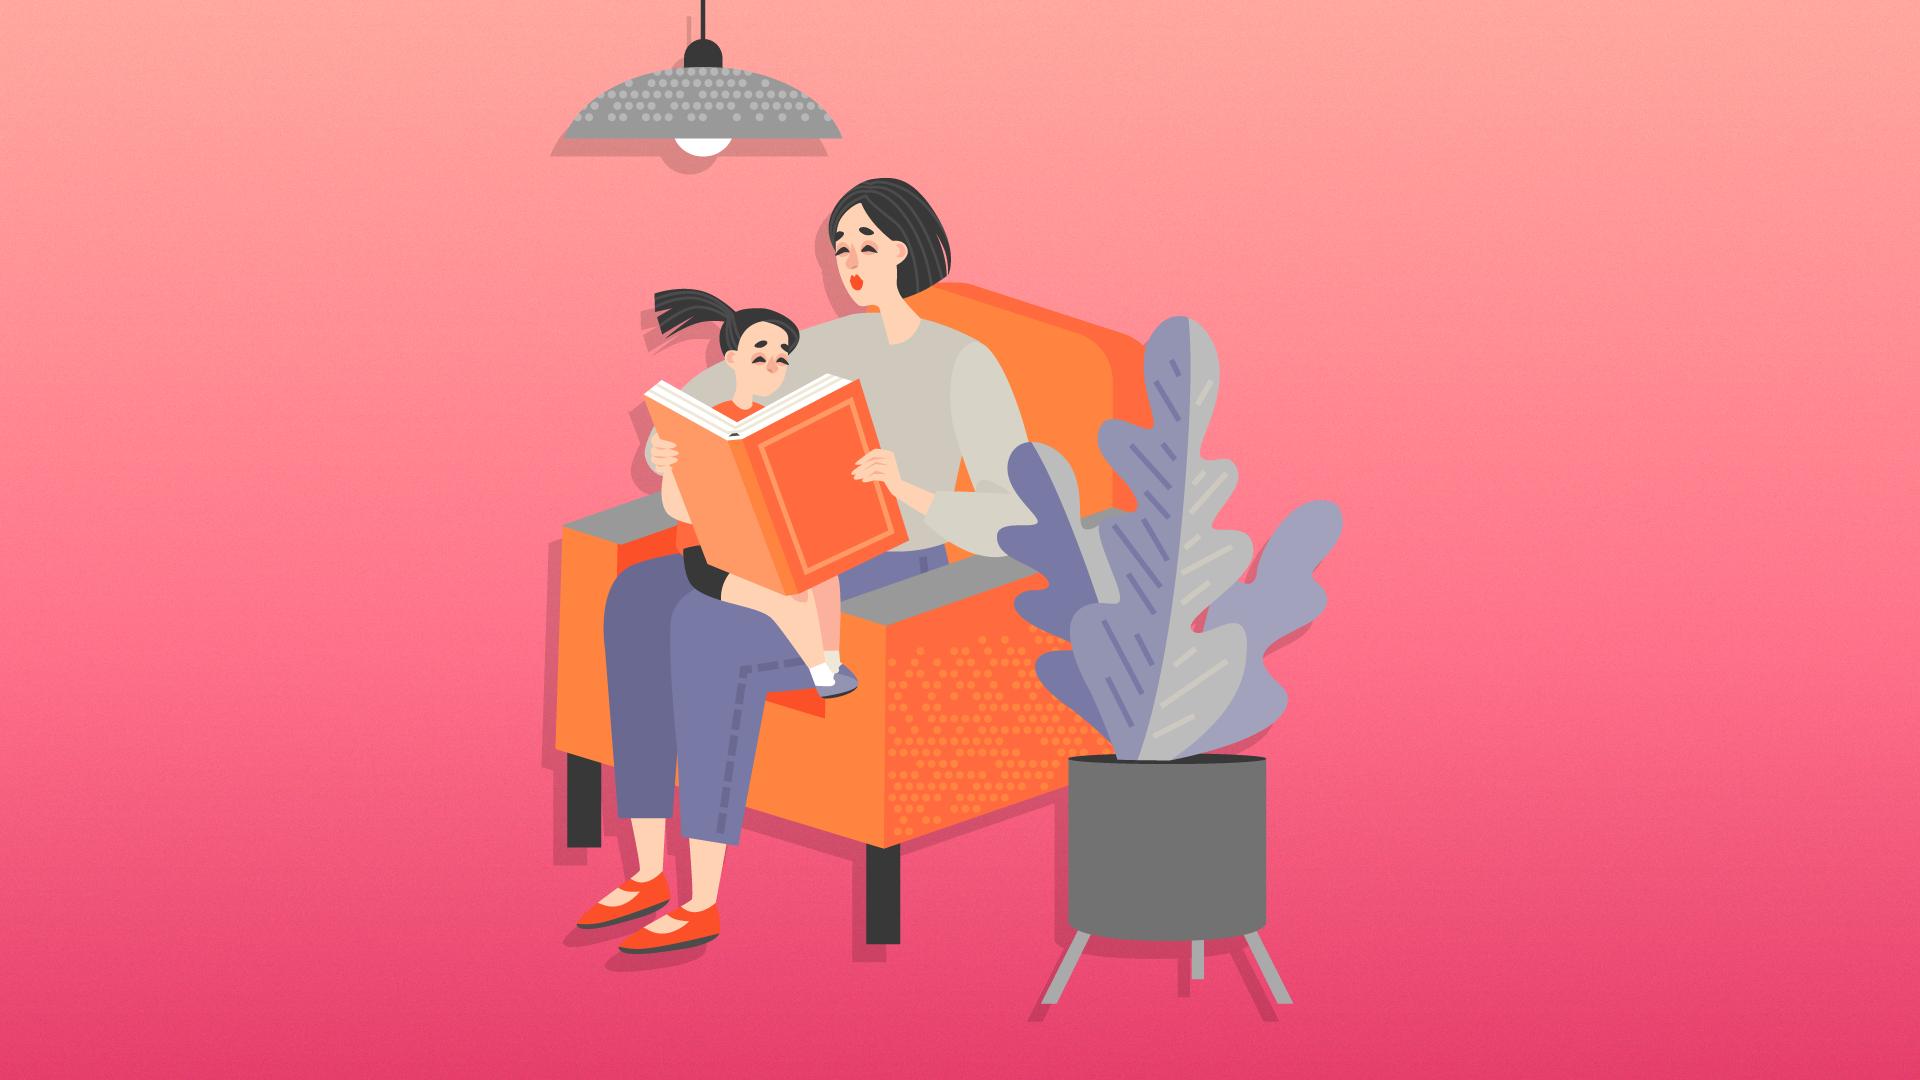 Mom reading to child